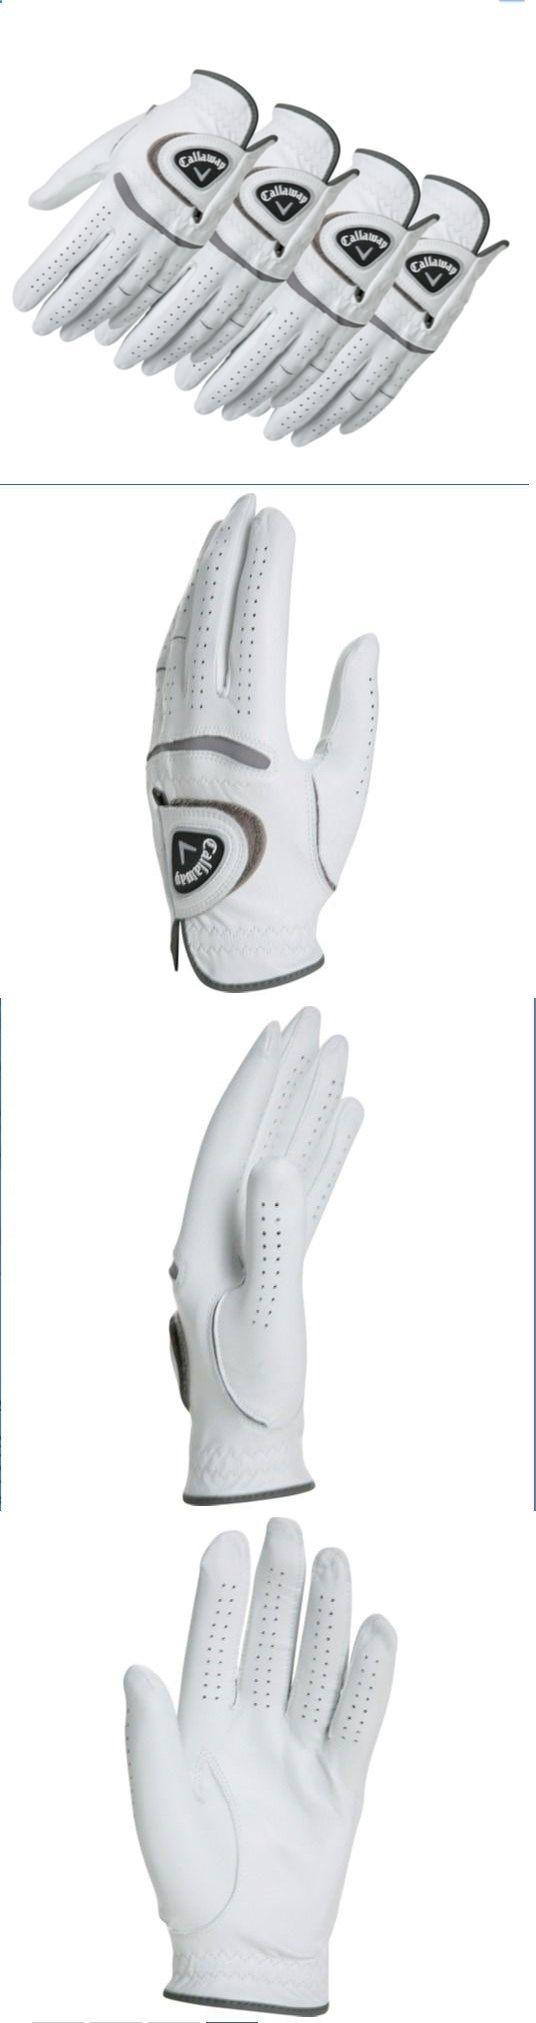 Cosmetics black leather gloves lyrics - Golf Gloves 181135 Callaway Mens 4 Pack Leather White Golf Gloves To Be